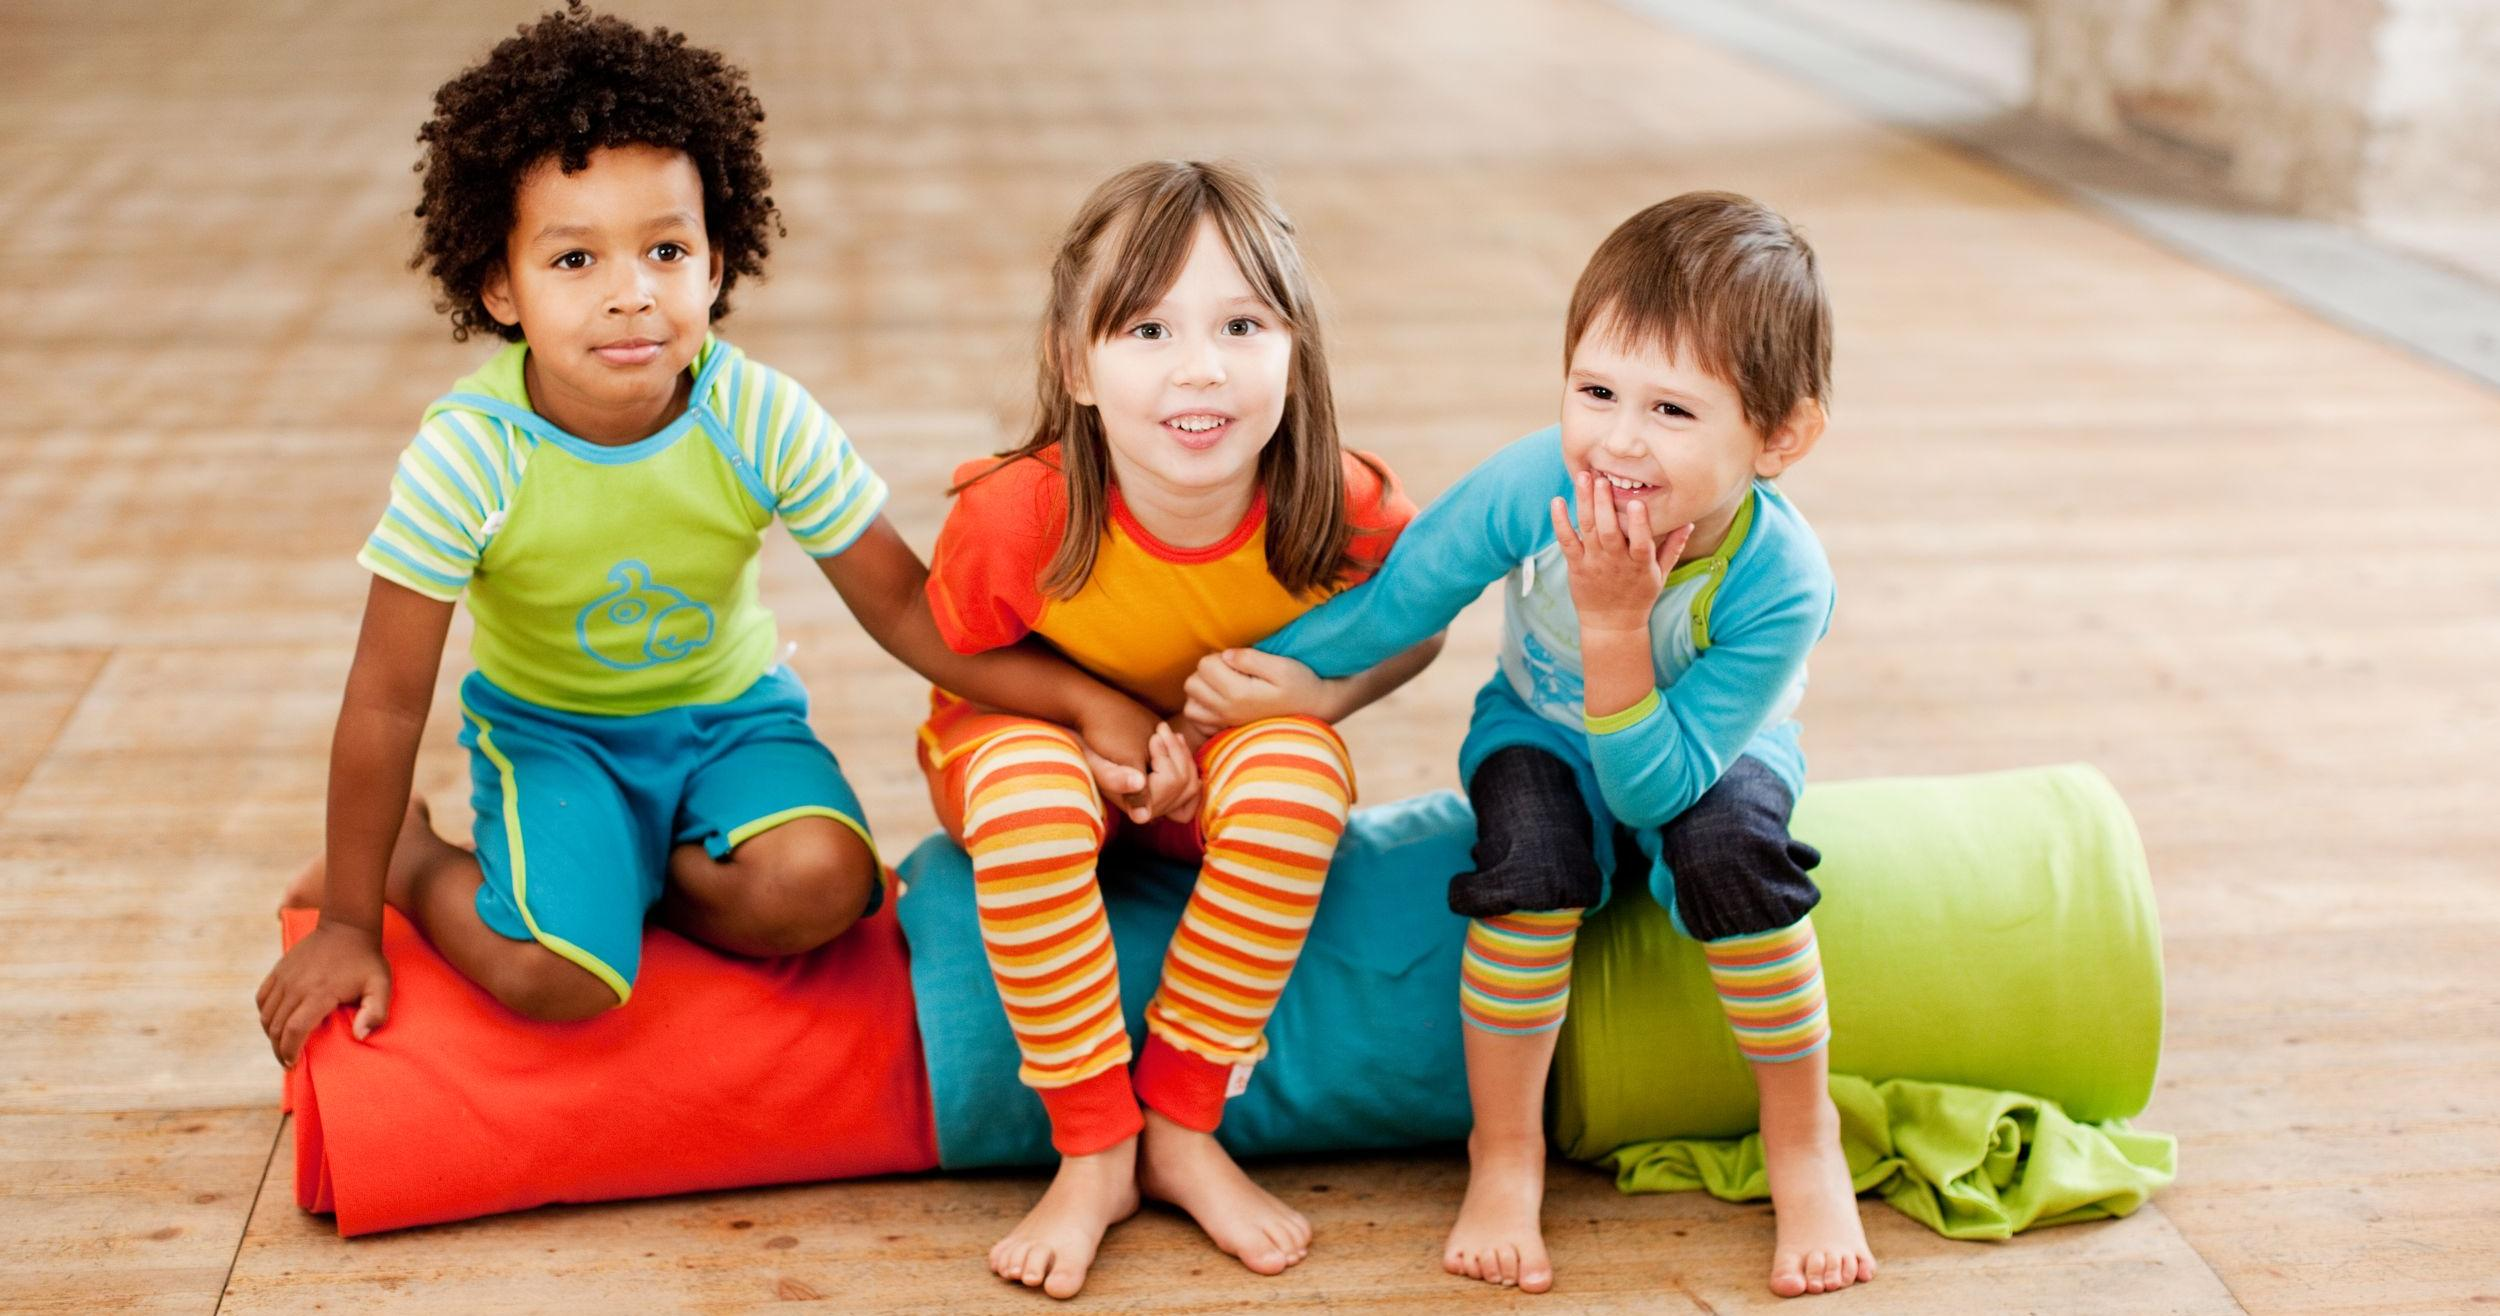 Taking Advantage of Online Kids Shop